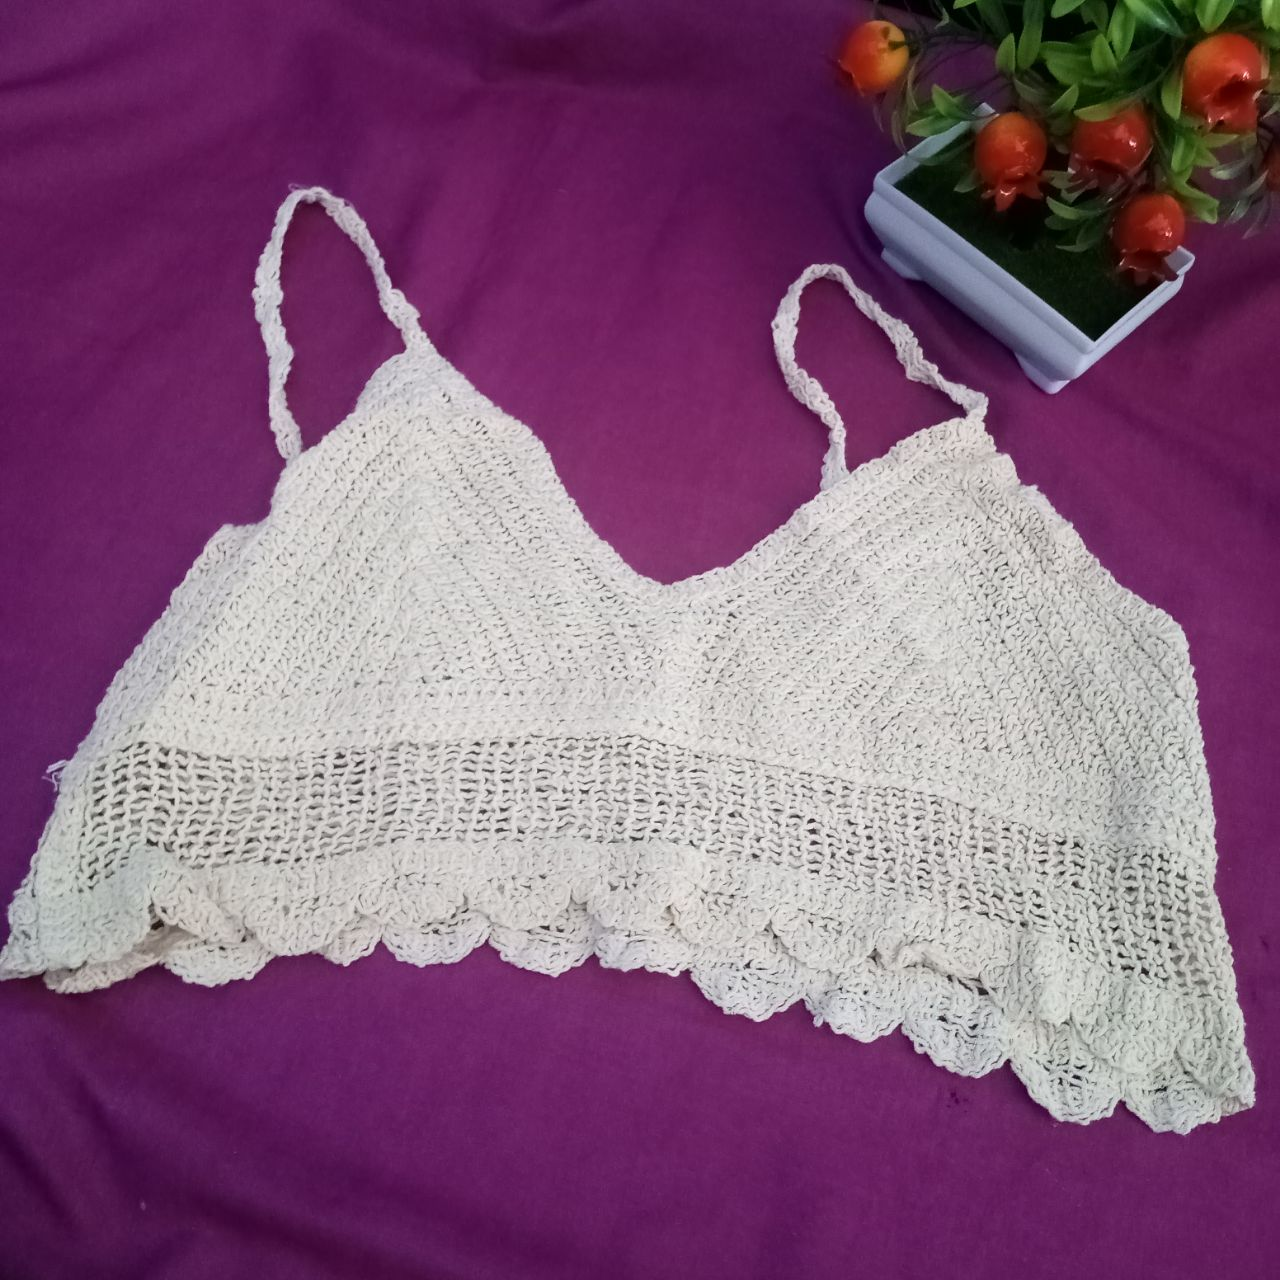 ini adalah Vest Bordir Nofi Cream, size: L, material: wool, color: Cream, brand: veststyleindonesia, age_group: all ages, gender: female